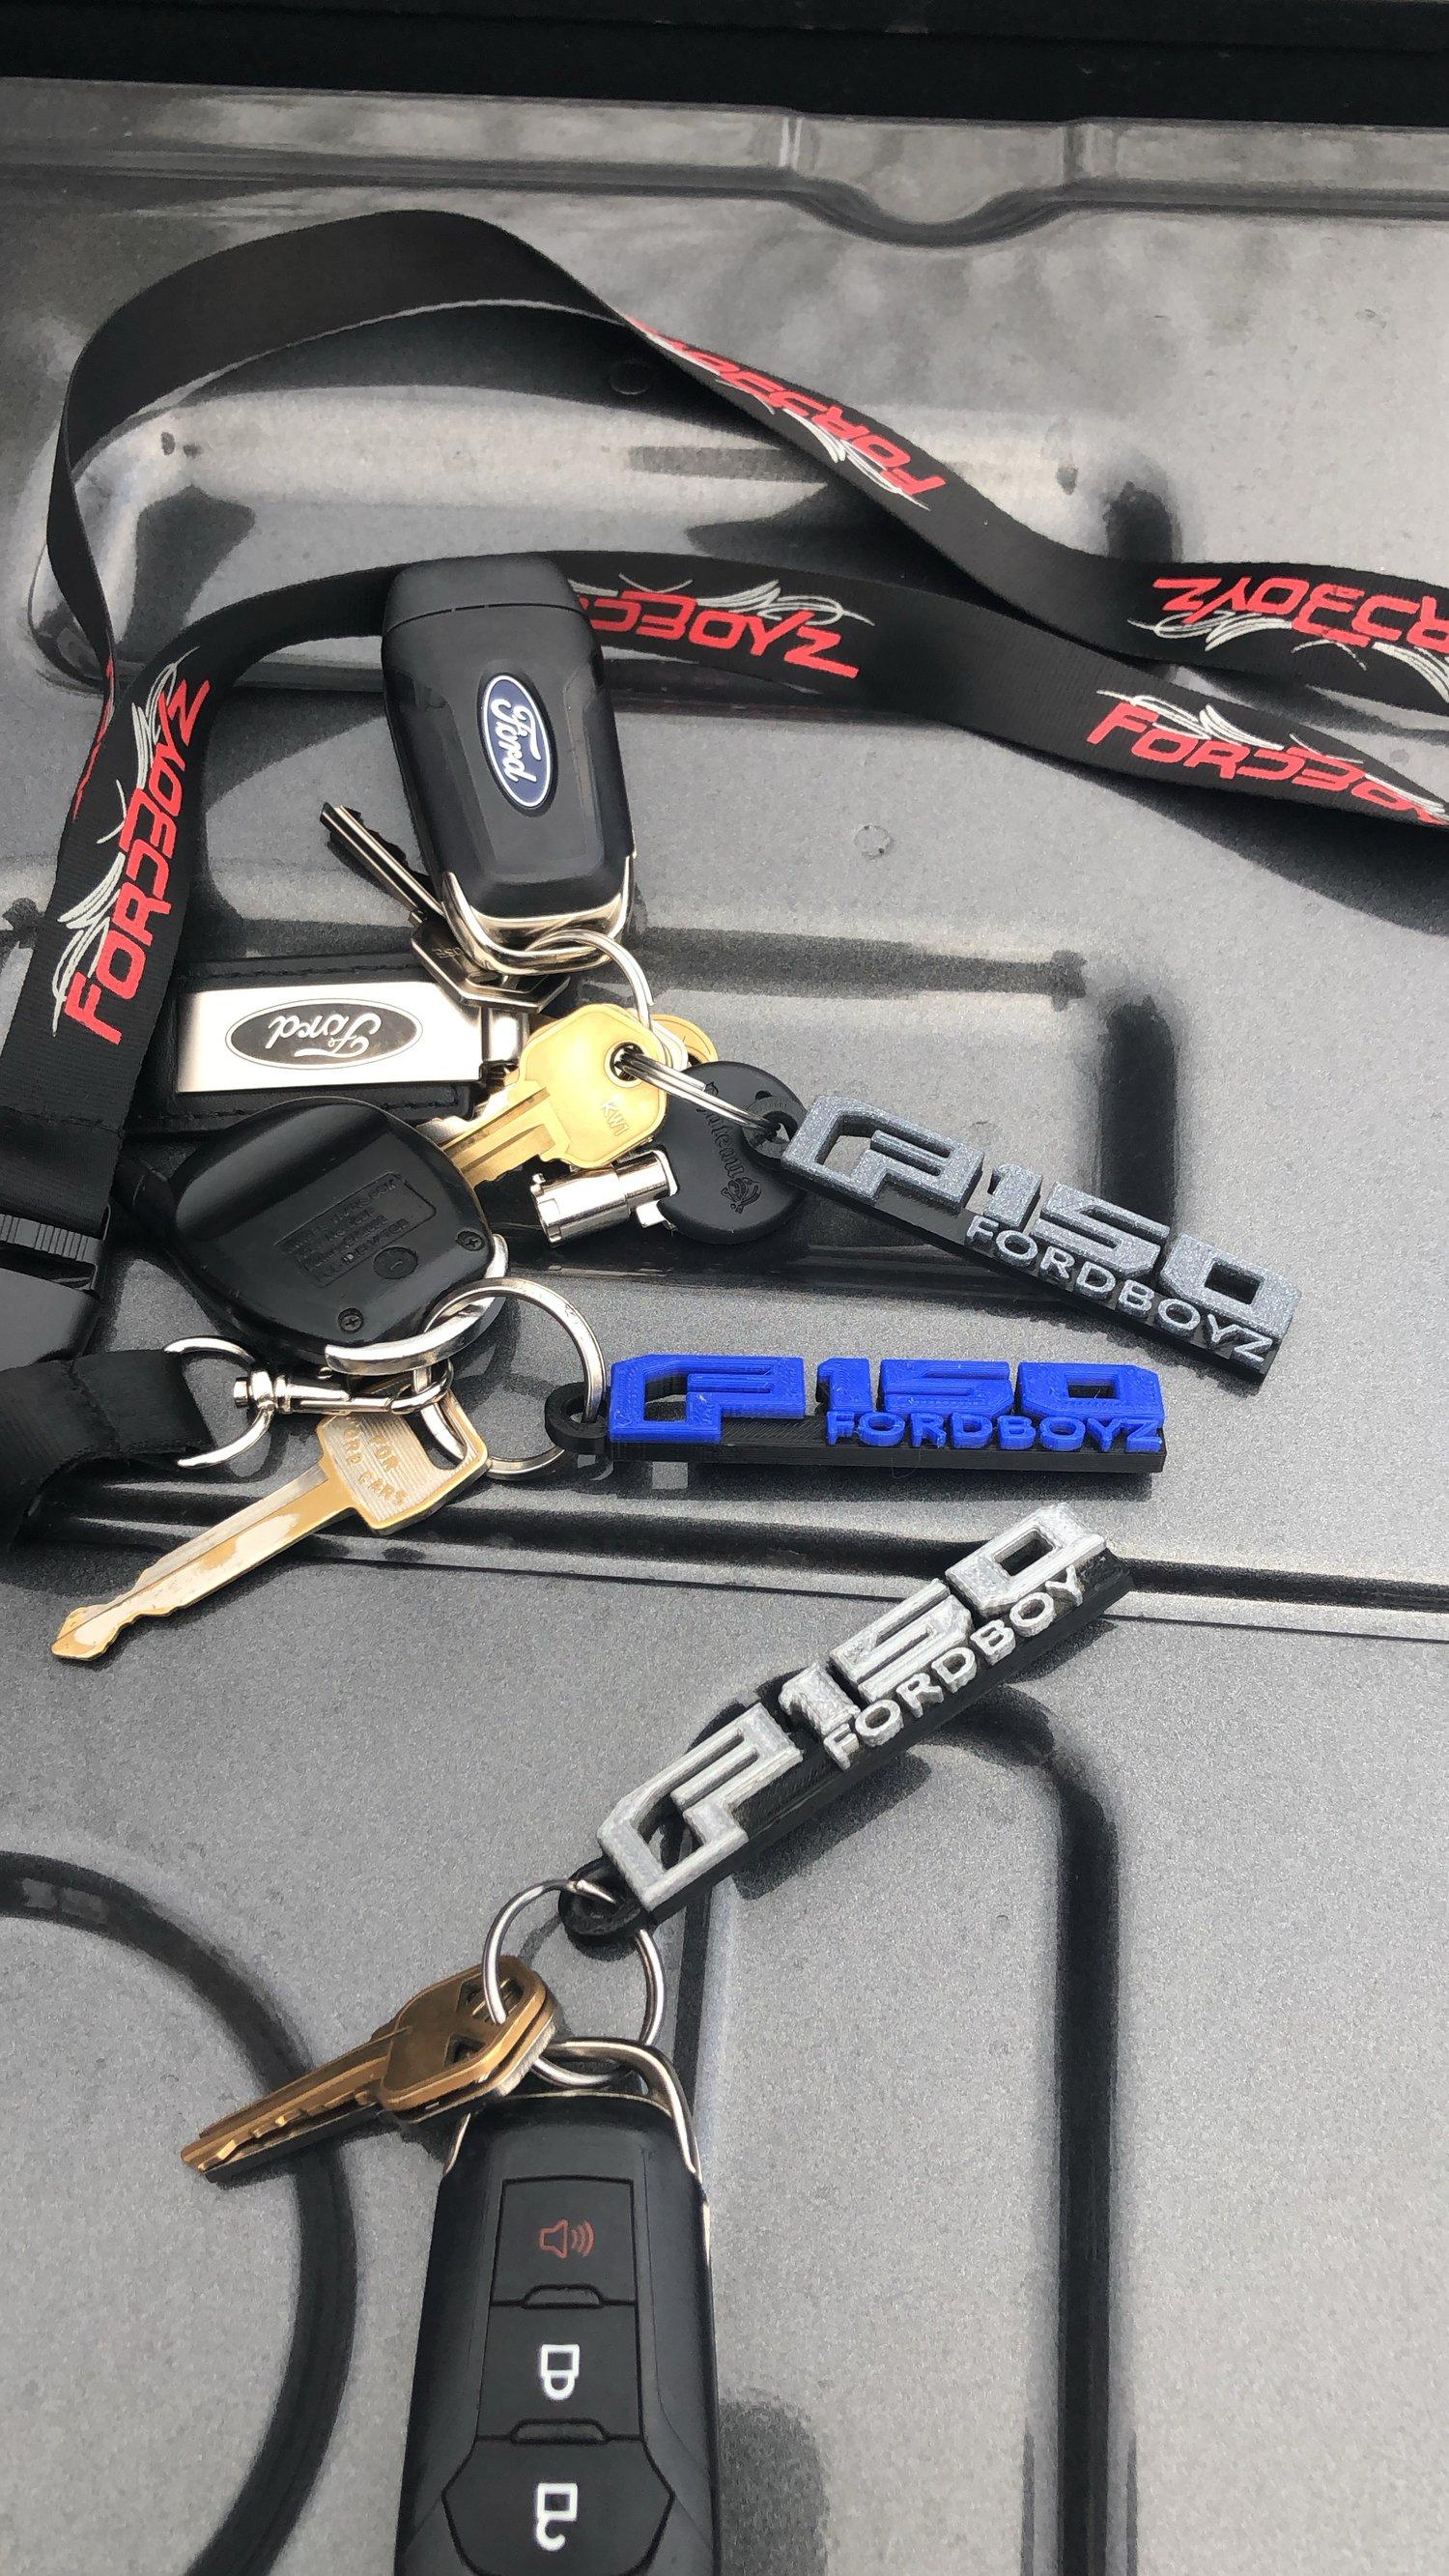 Image of F150 Keychain